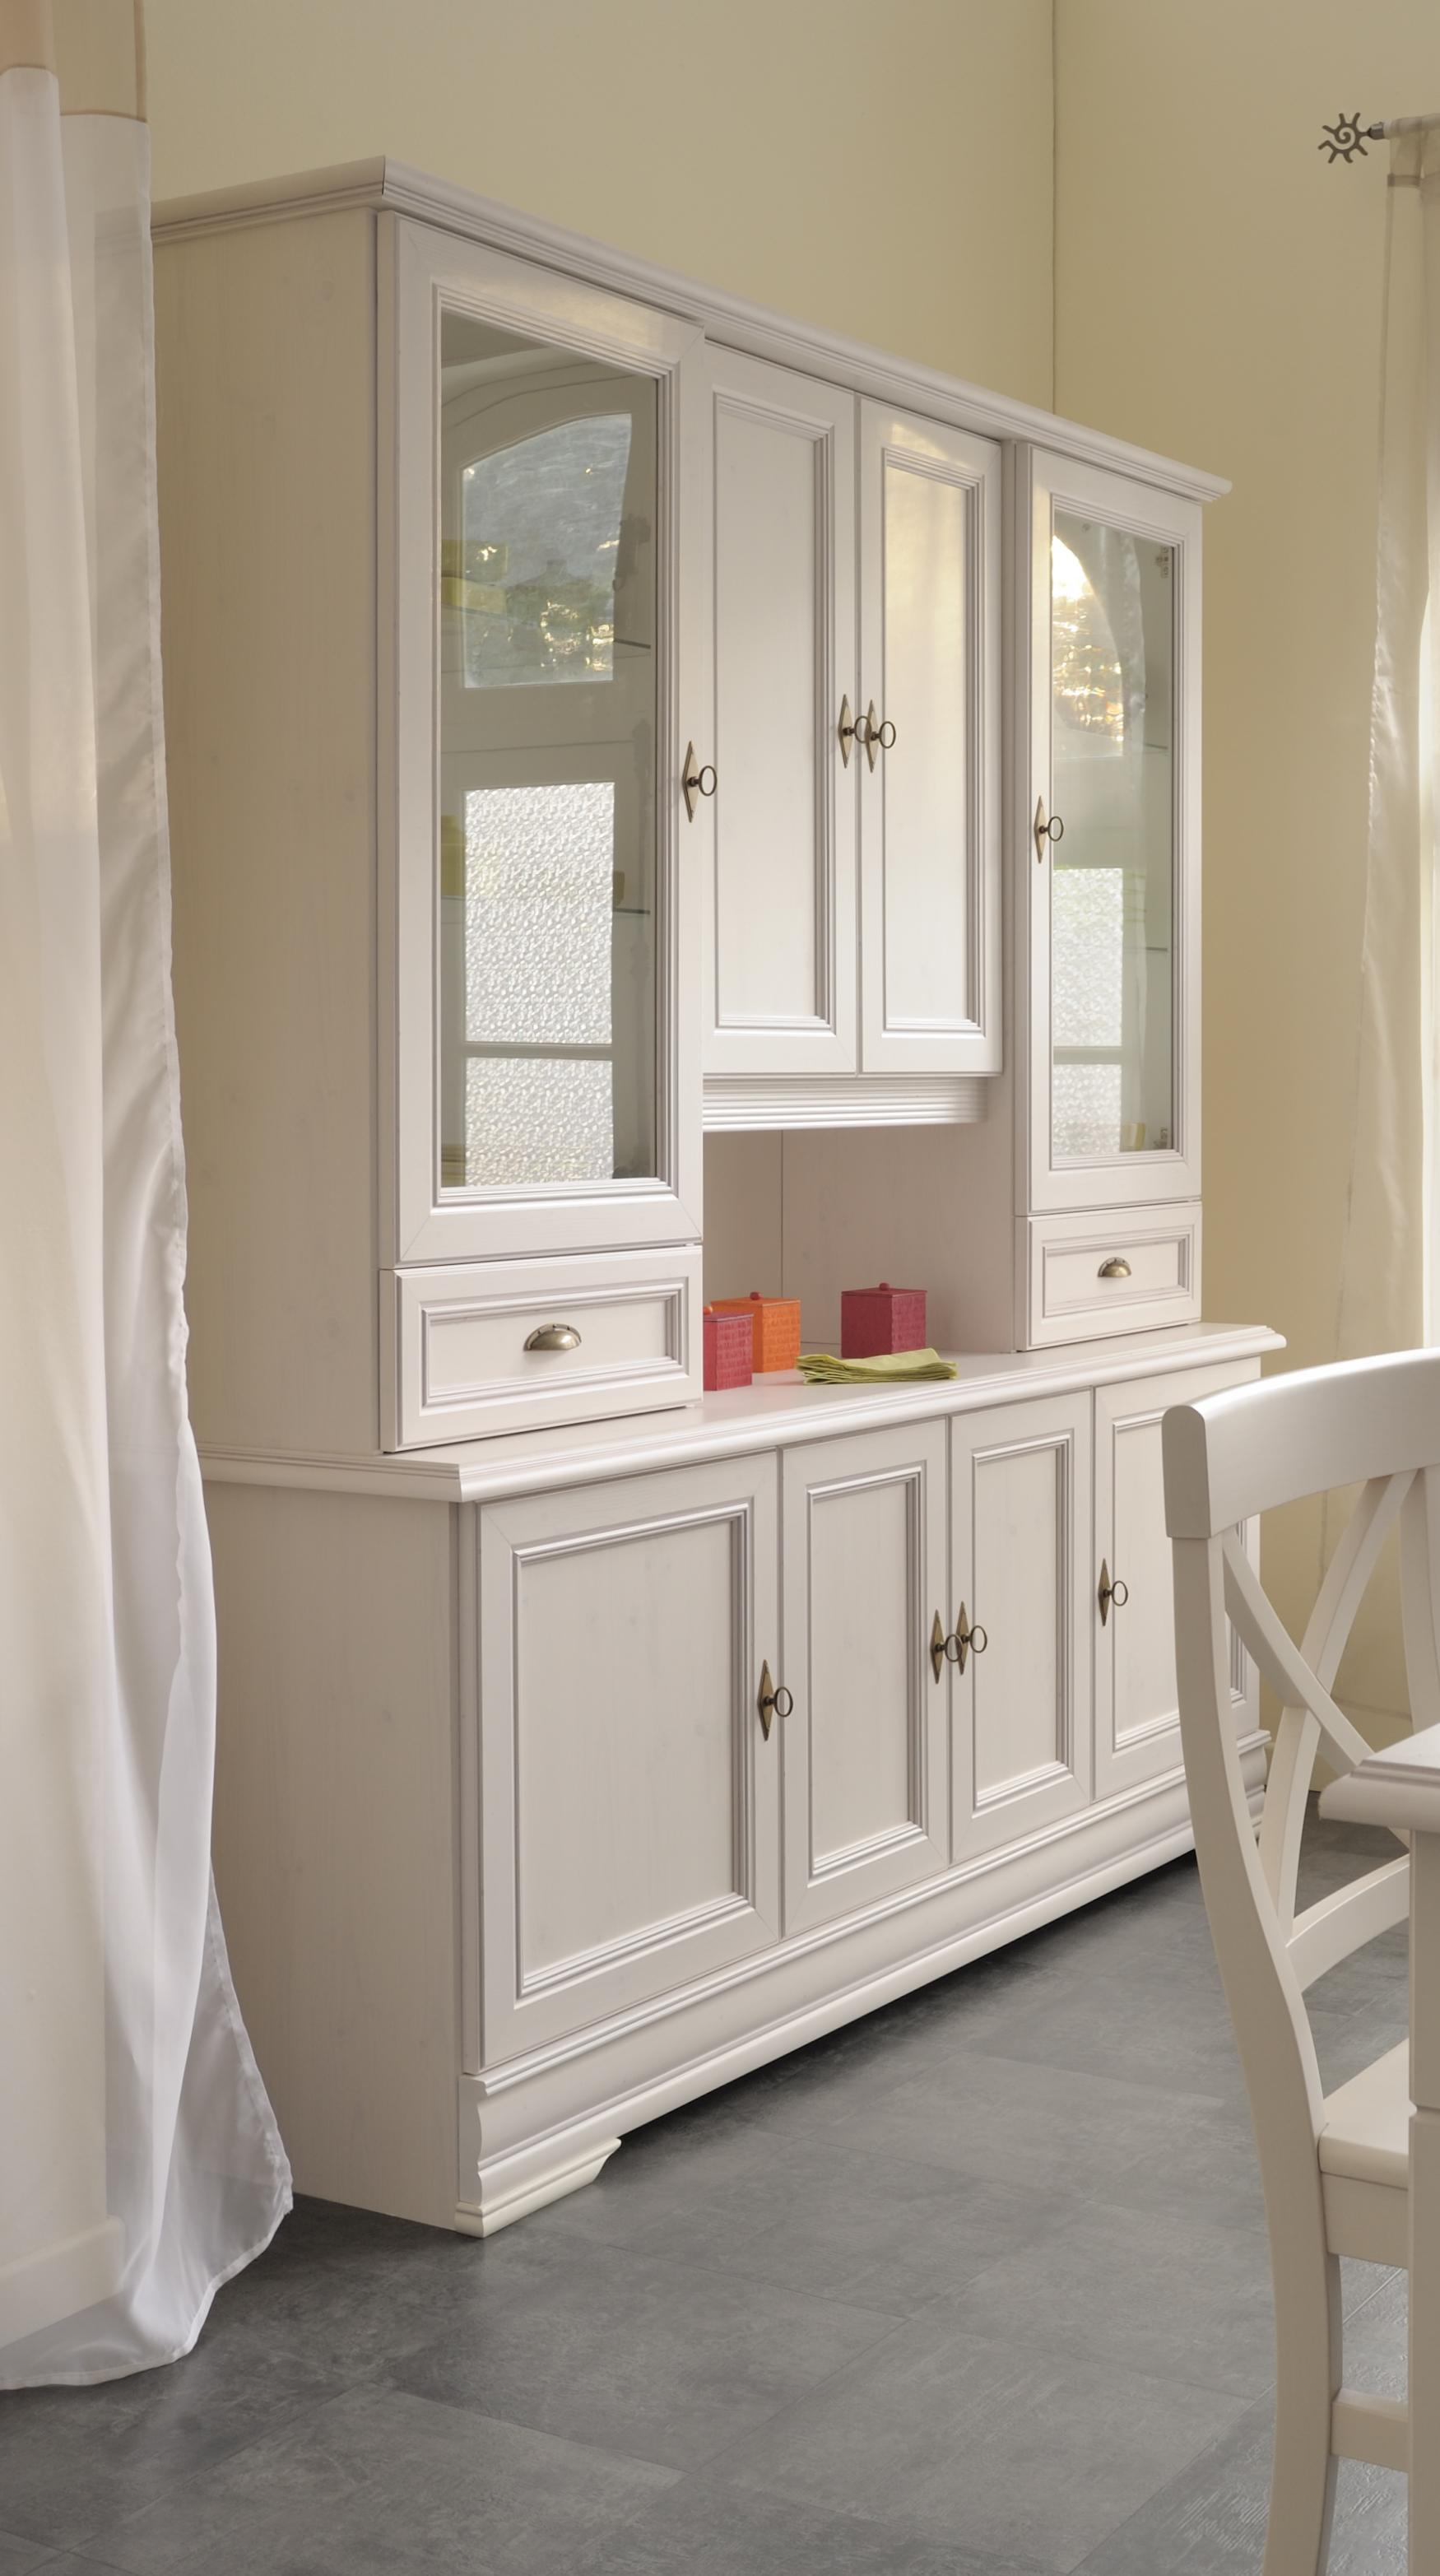 highboard vitrine kiefer weiss nachbildung elise8. Black Bedroom Furniture Sets. Home Design Ideas